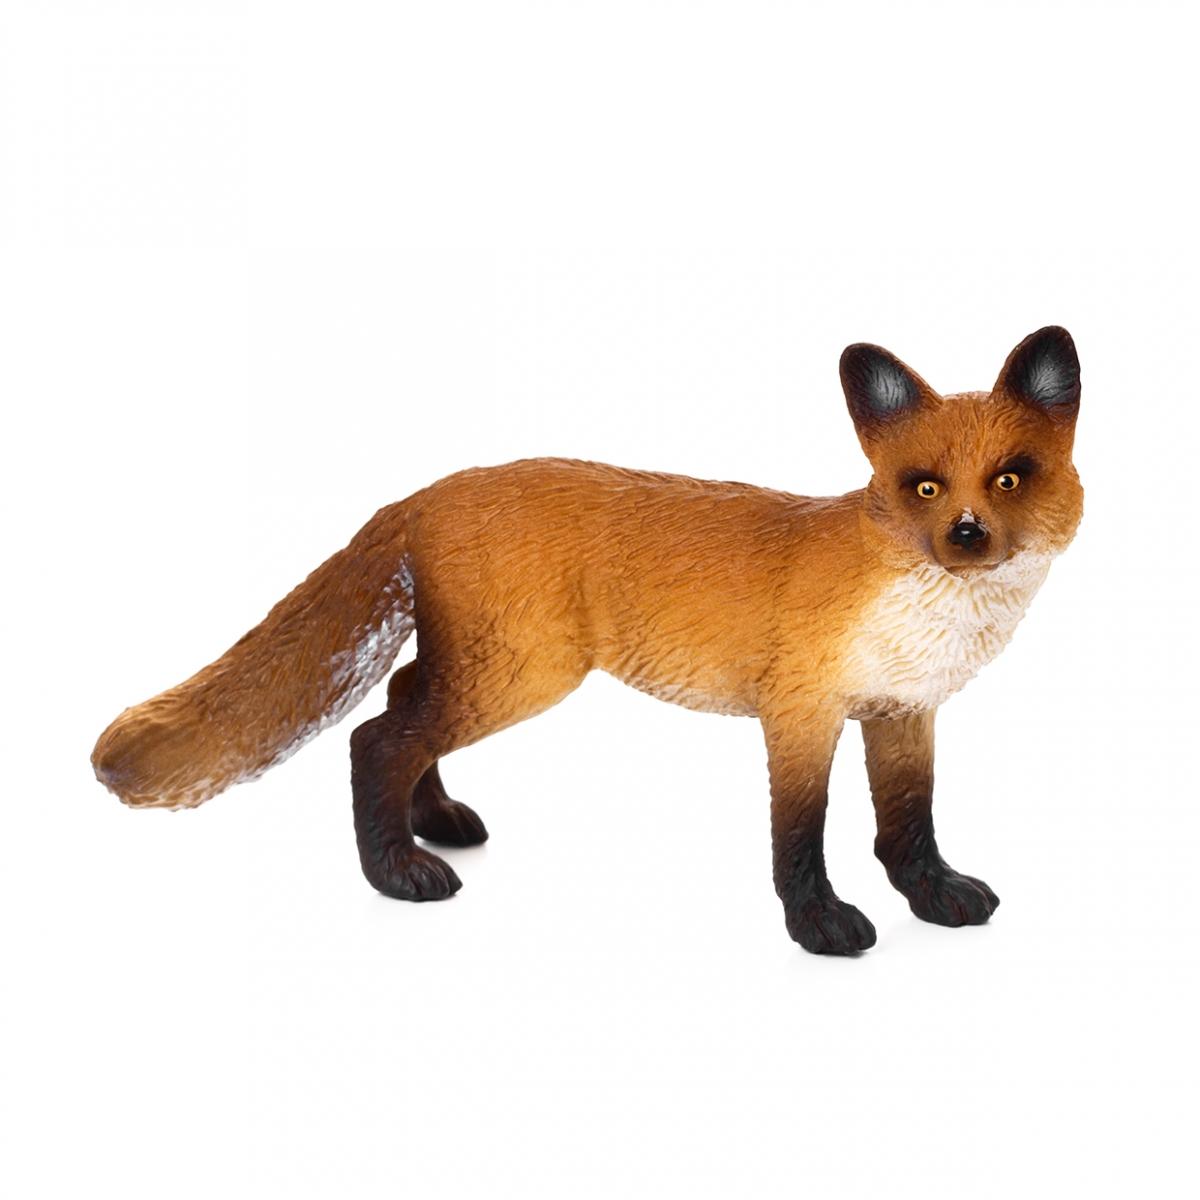 Imagen de un zorro